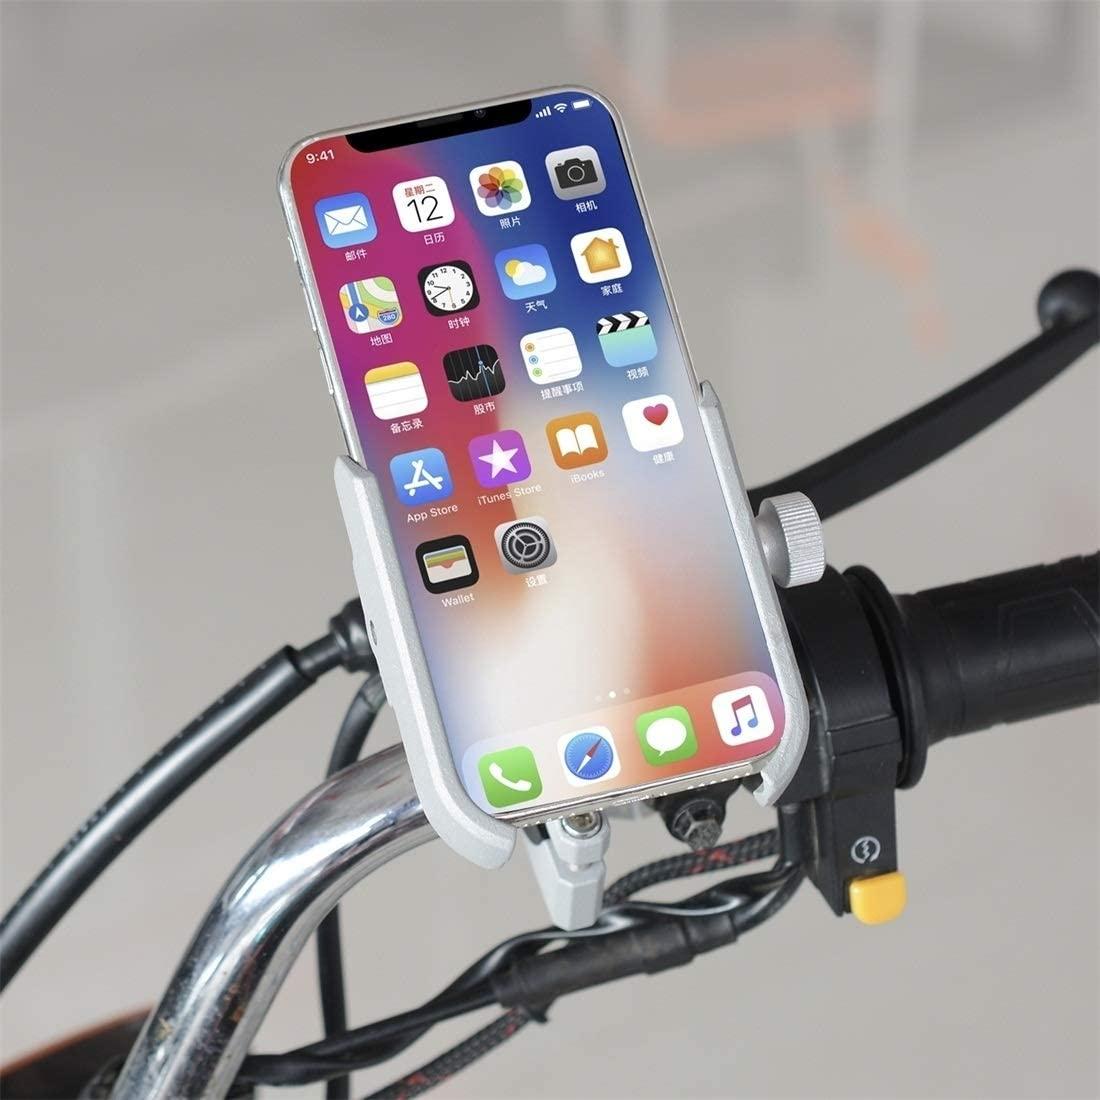 Happyshopping Bracket Motorcycle Aluminium Alloy Pressure Casting Mobile Phone Holder Bracket, Handlebar Version (Black) (Color : Silver)